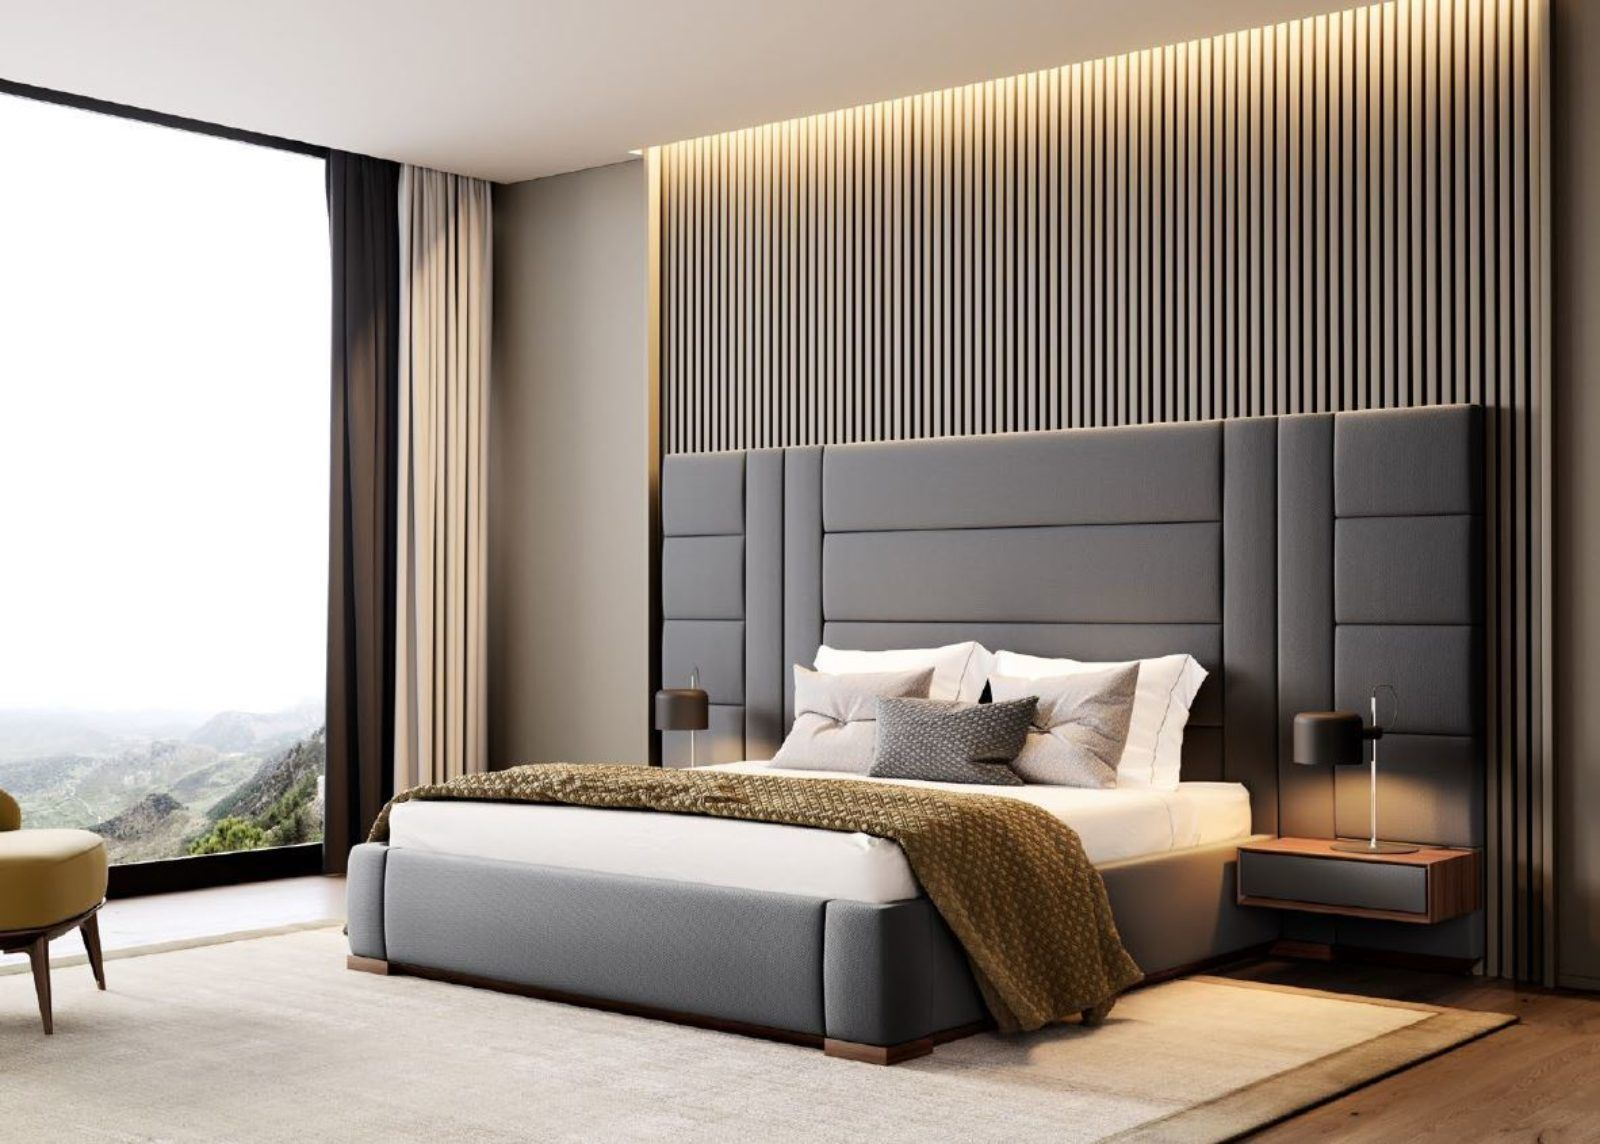 Luxurycontemporarybedrooms Luxurious Bedrooms Luxury Bedroom Design Luxury Bedroom Master